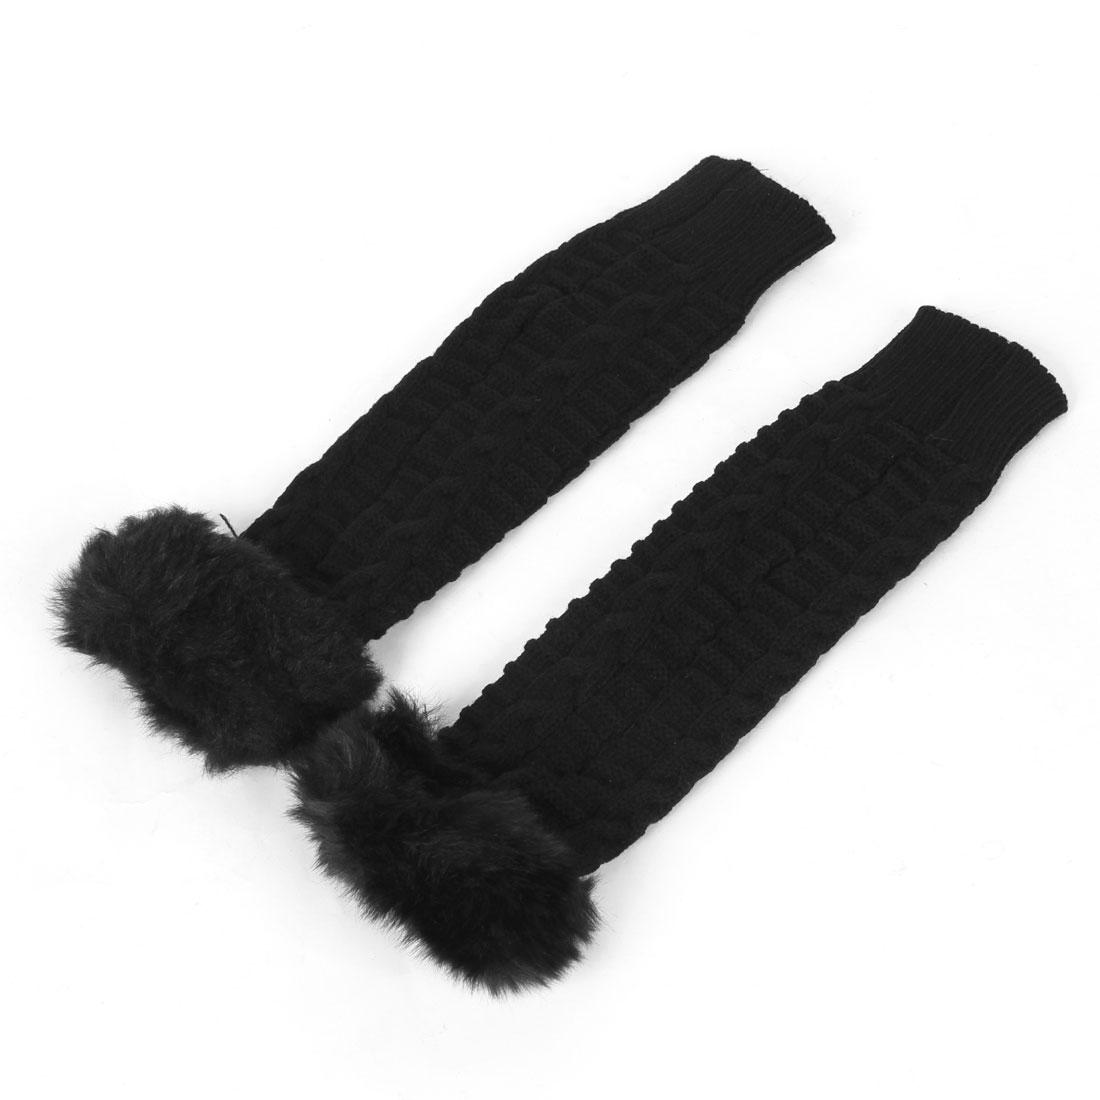 Black Faux Fur Detail Elastic Ribbed Fingerless Gloves Pair for Ladies